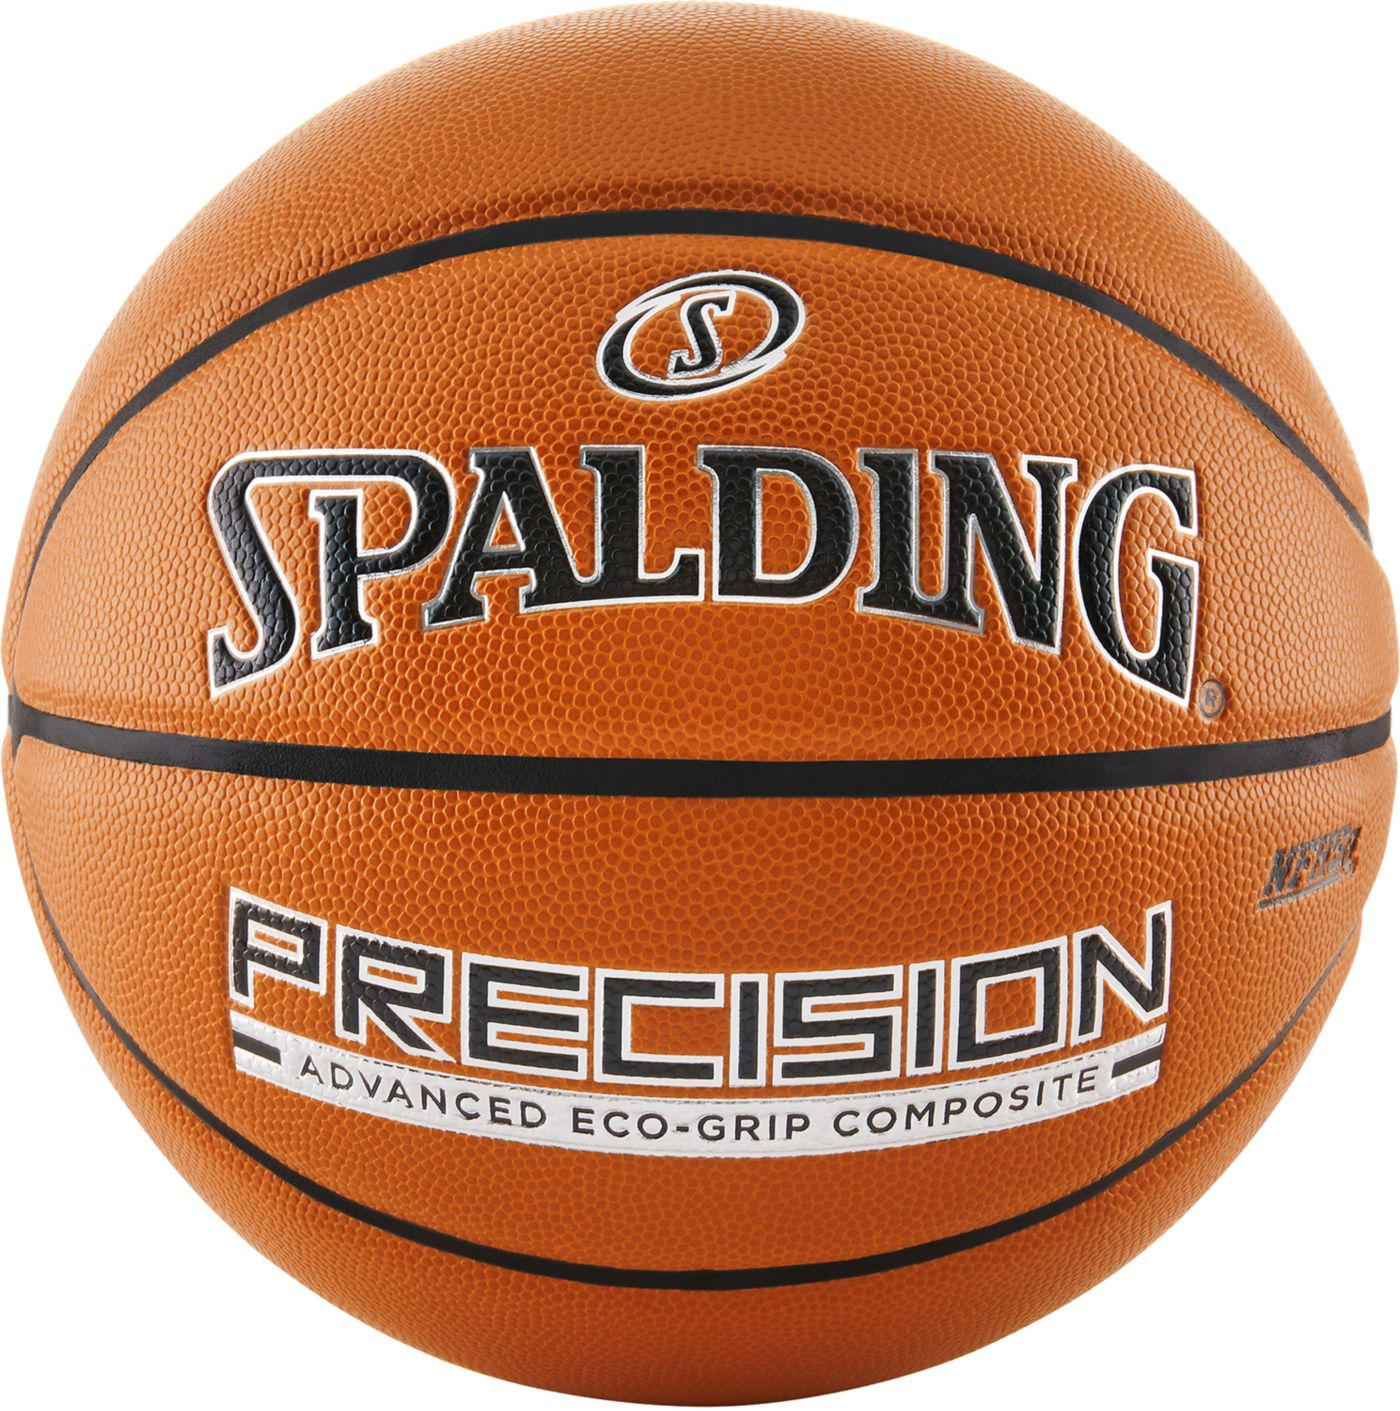 "Spalding Precision Official Basketball (29.5"")"